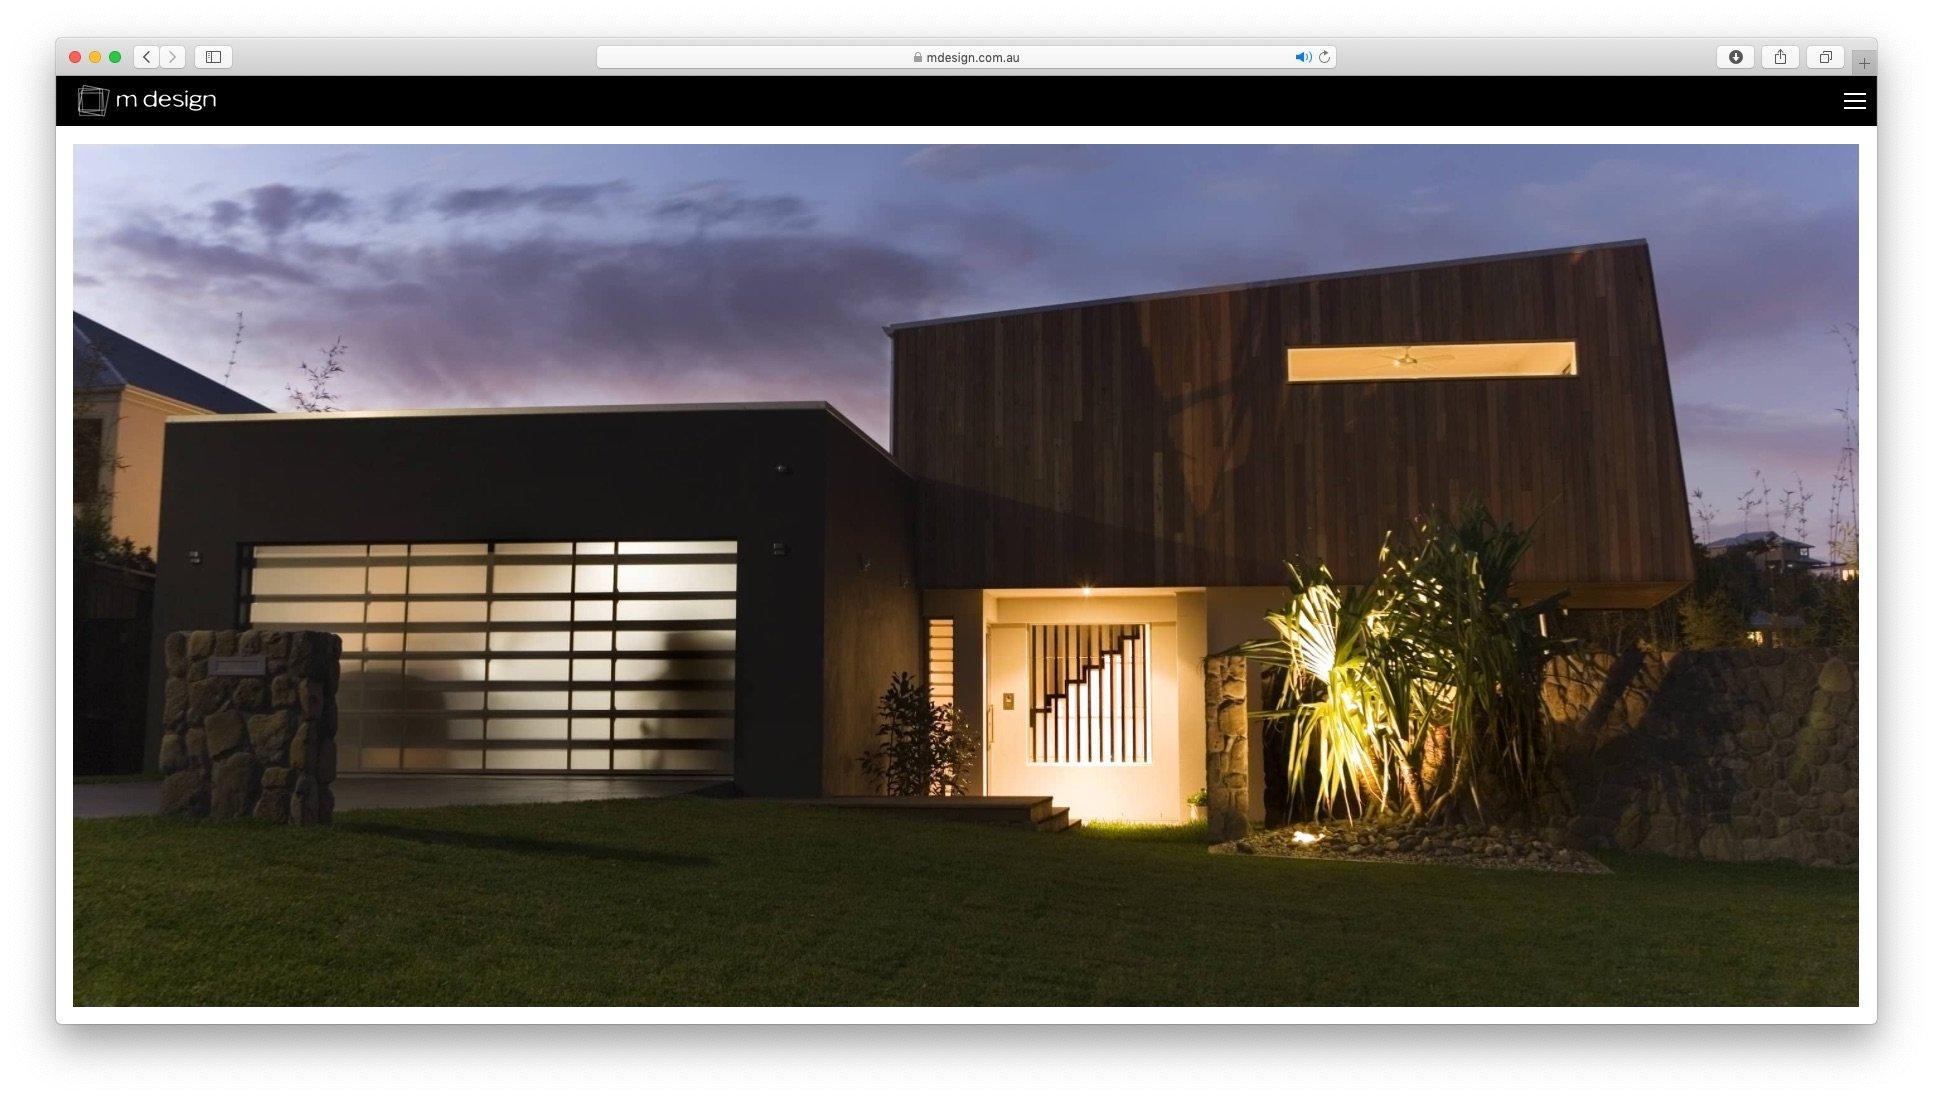 mdesign web design by Whitelam Media